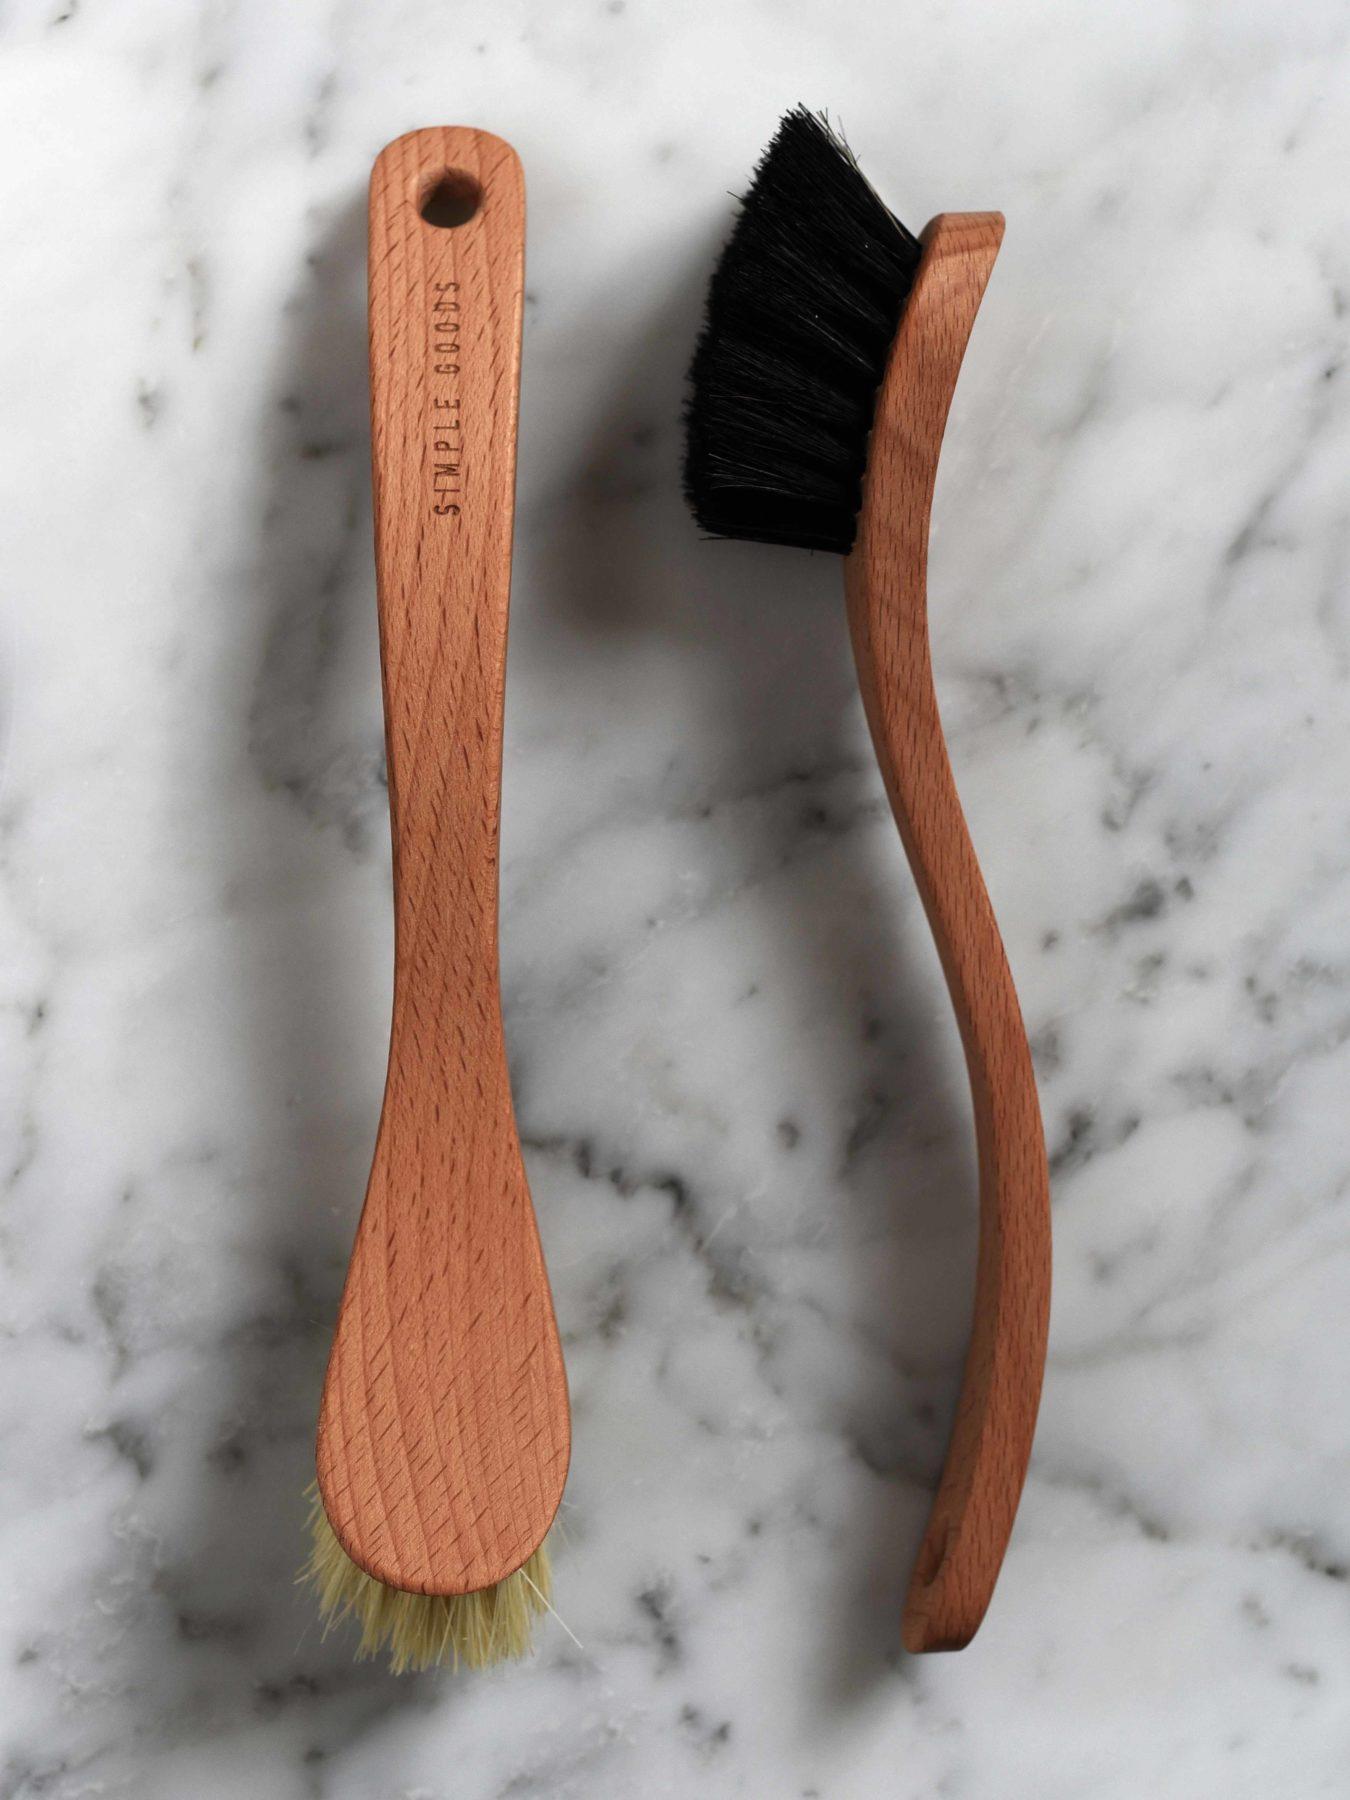 Simple Goods - Dish Brush Soft